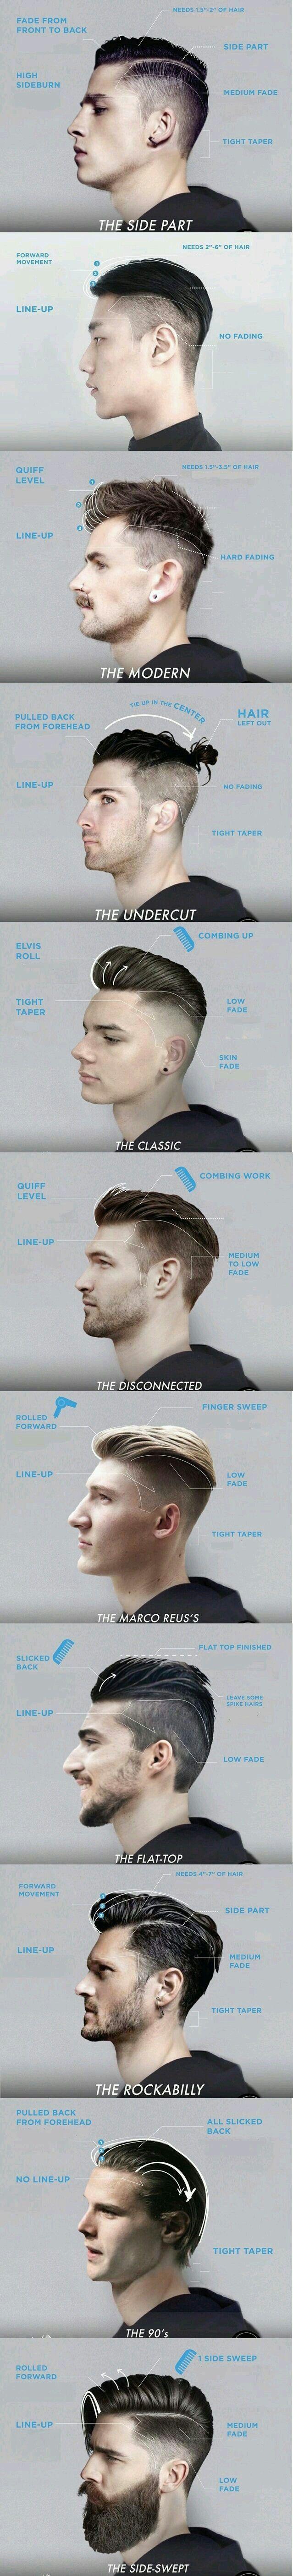 Pin by heather vega on hair pinterest asian men hairstyles men